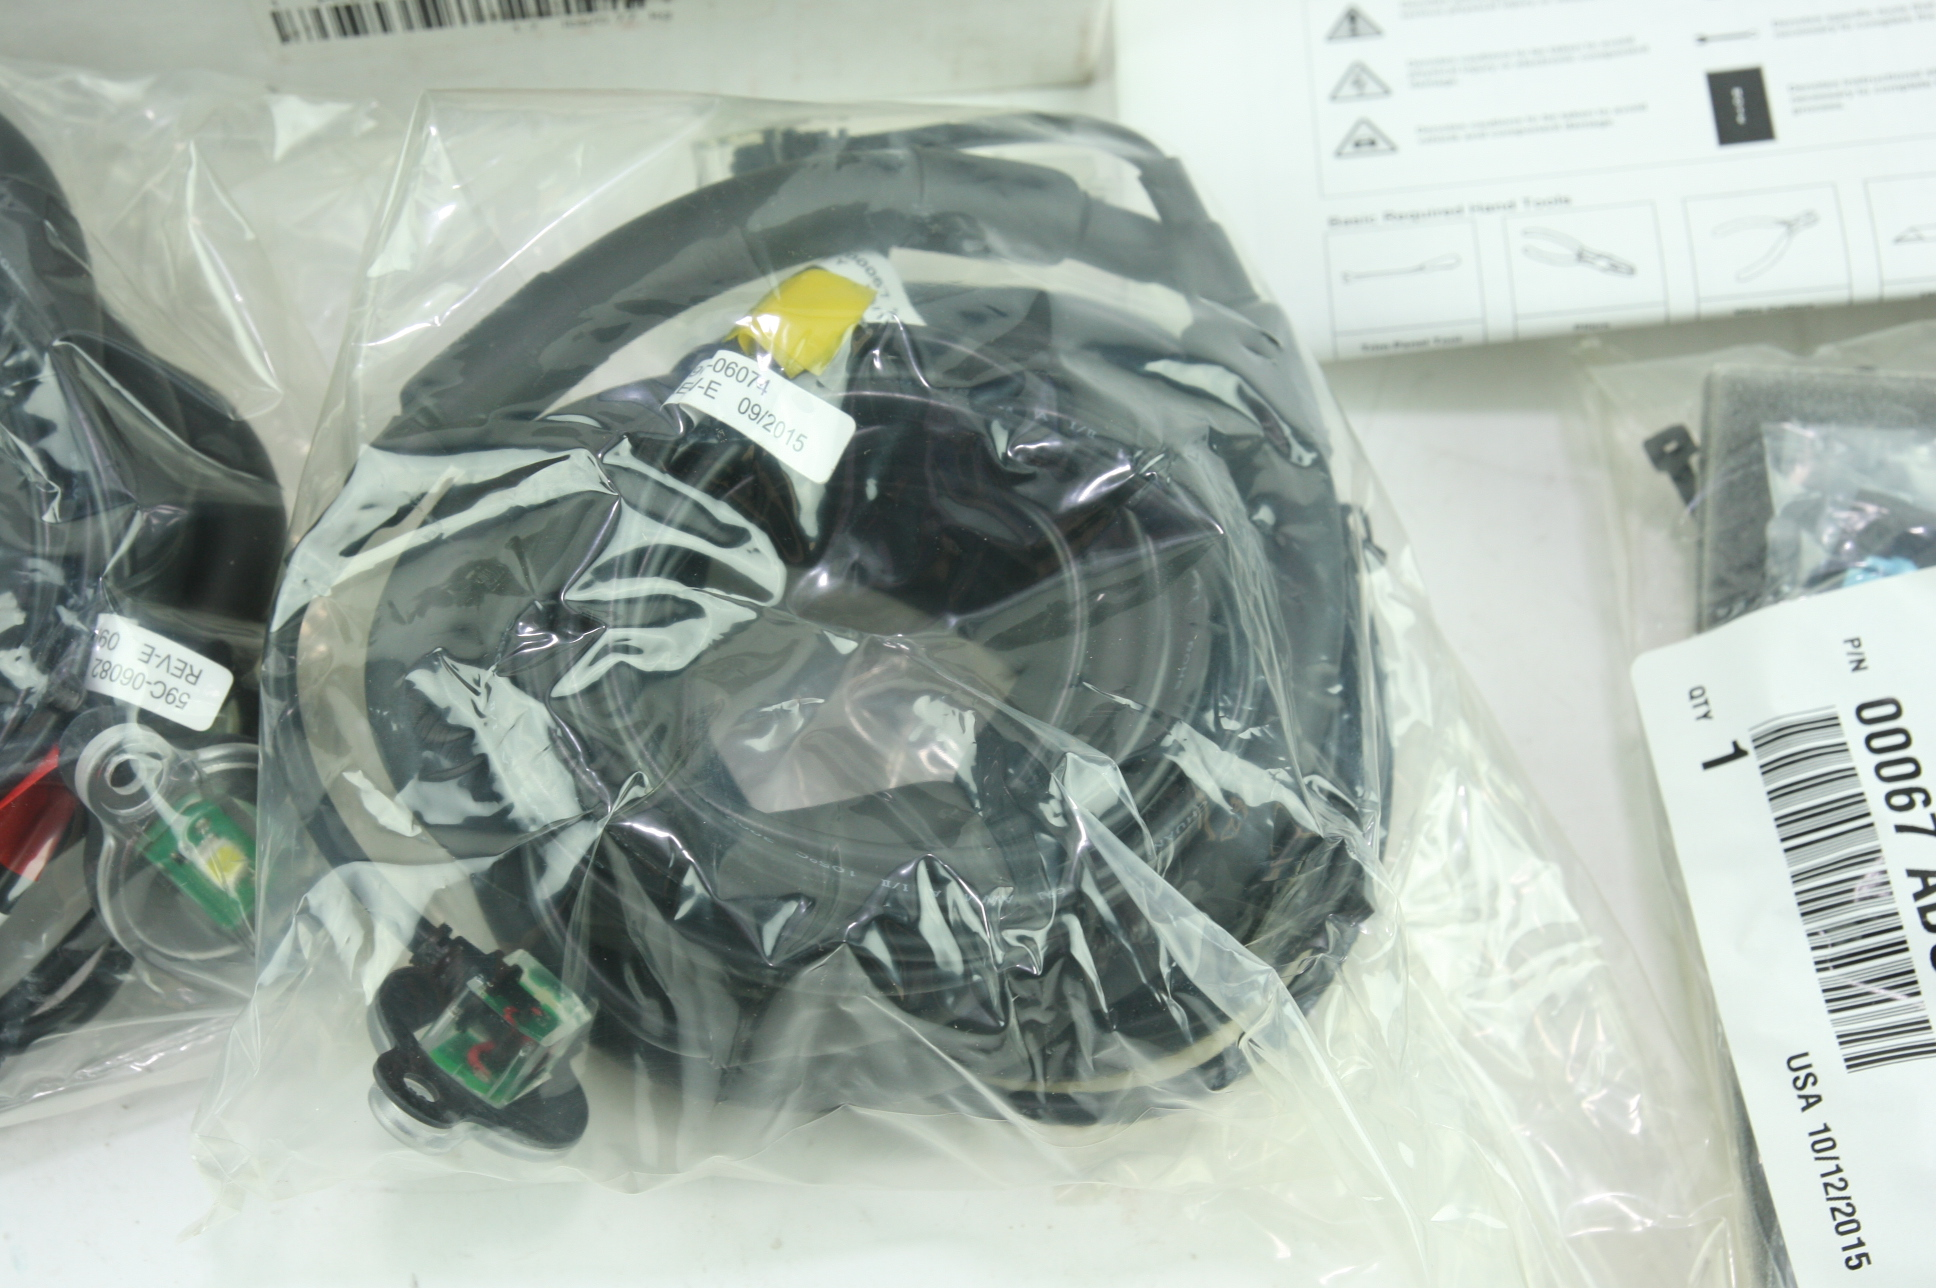 ** Genuine Kia 14-19 Soul Exterior LED Lighting Kit New OEM Packaging B2067ADU01 - image 8